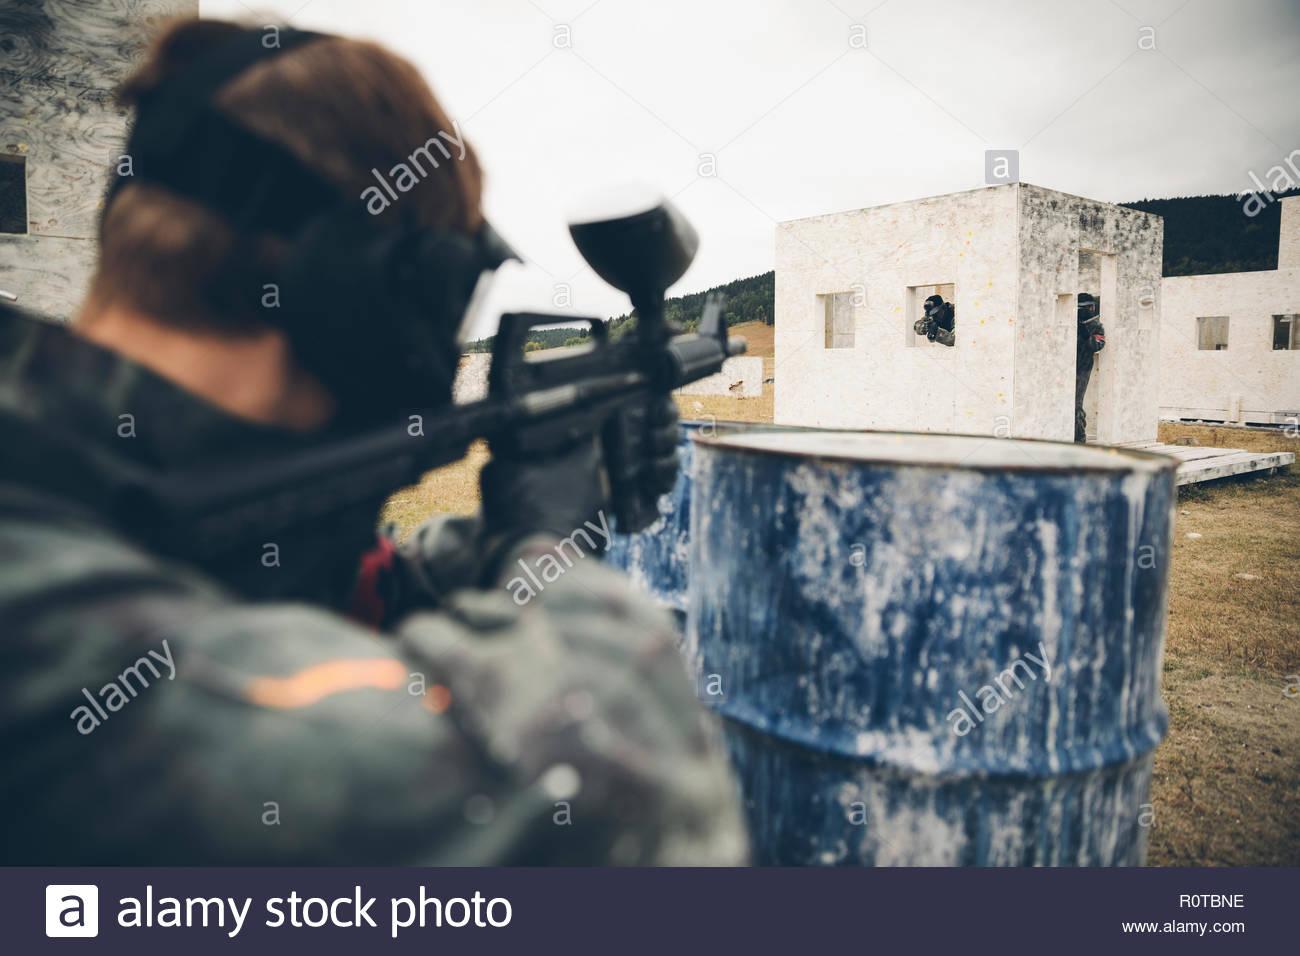 El hombre detrás de paintball barril Imagen De Stock